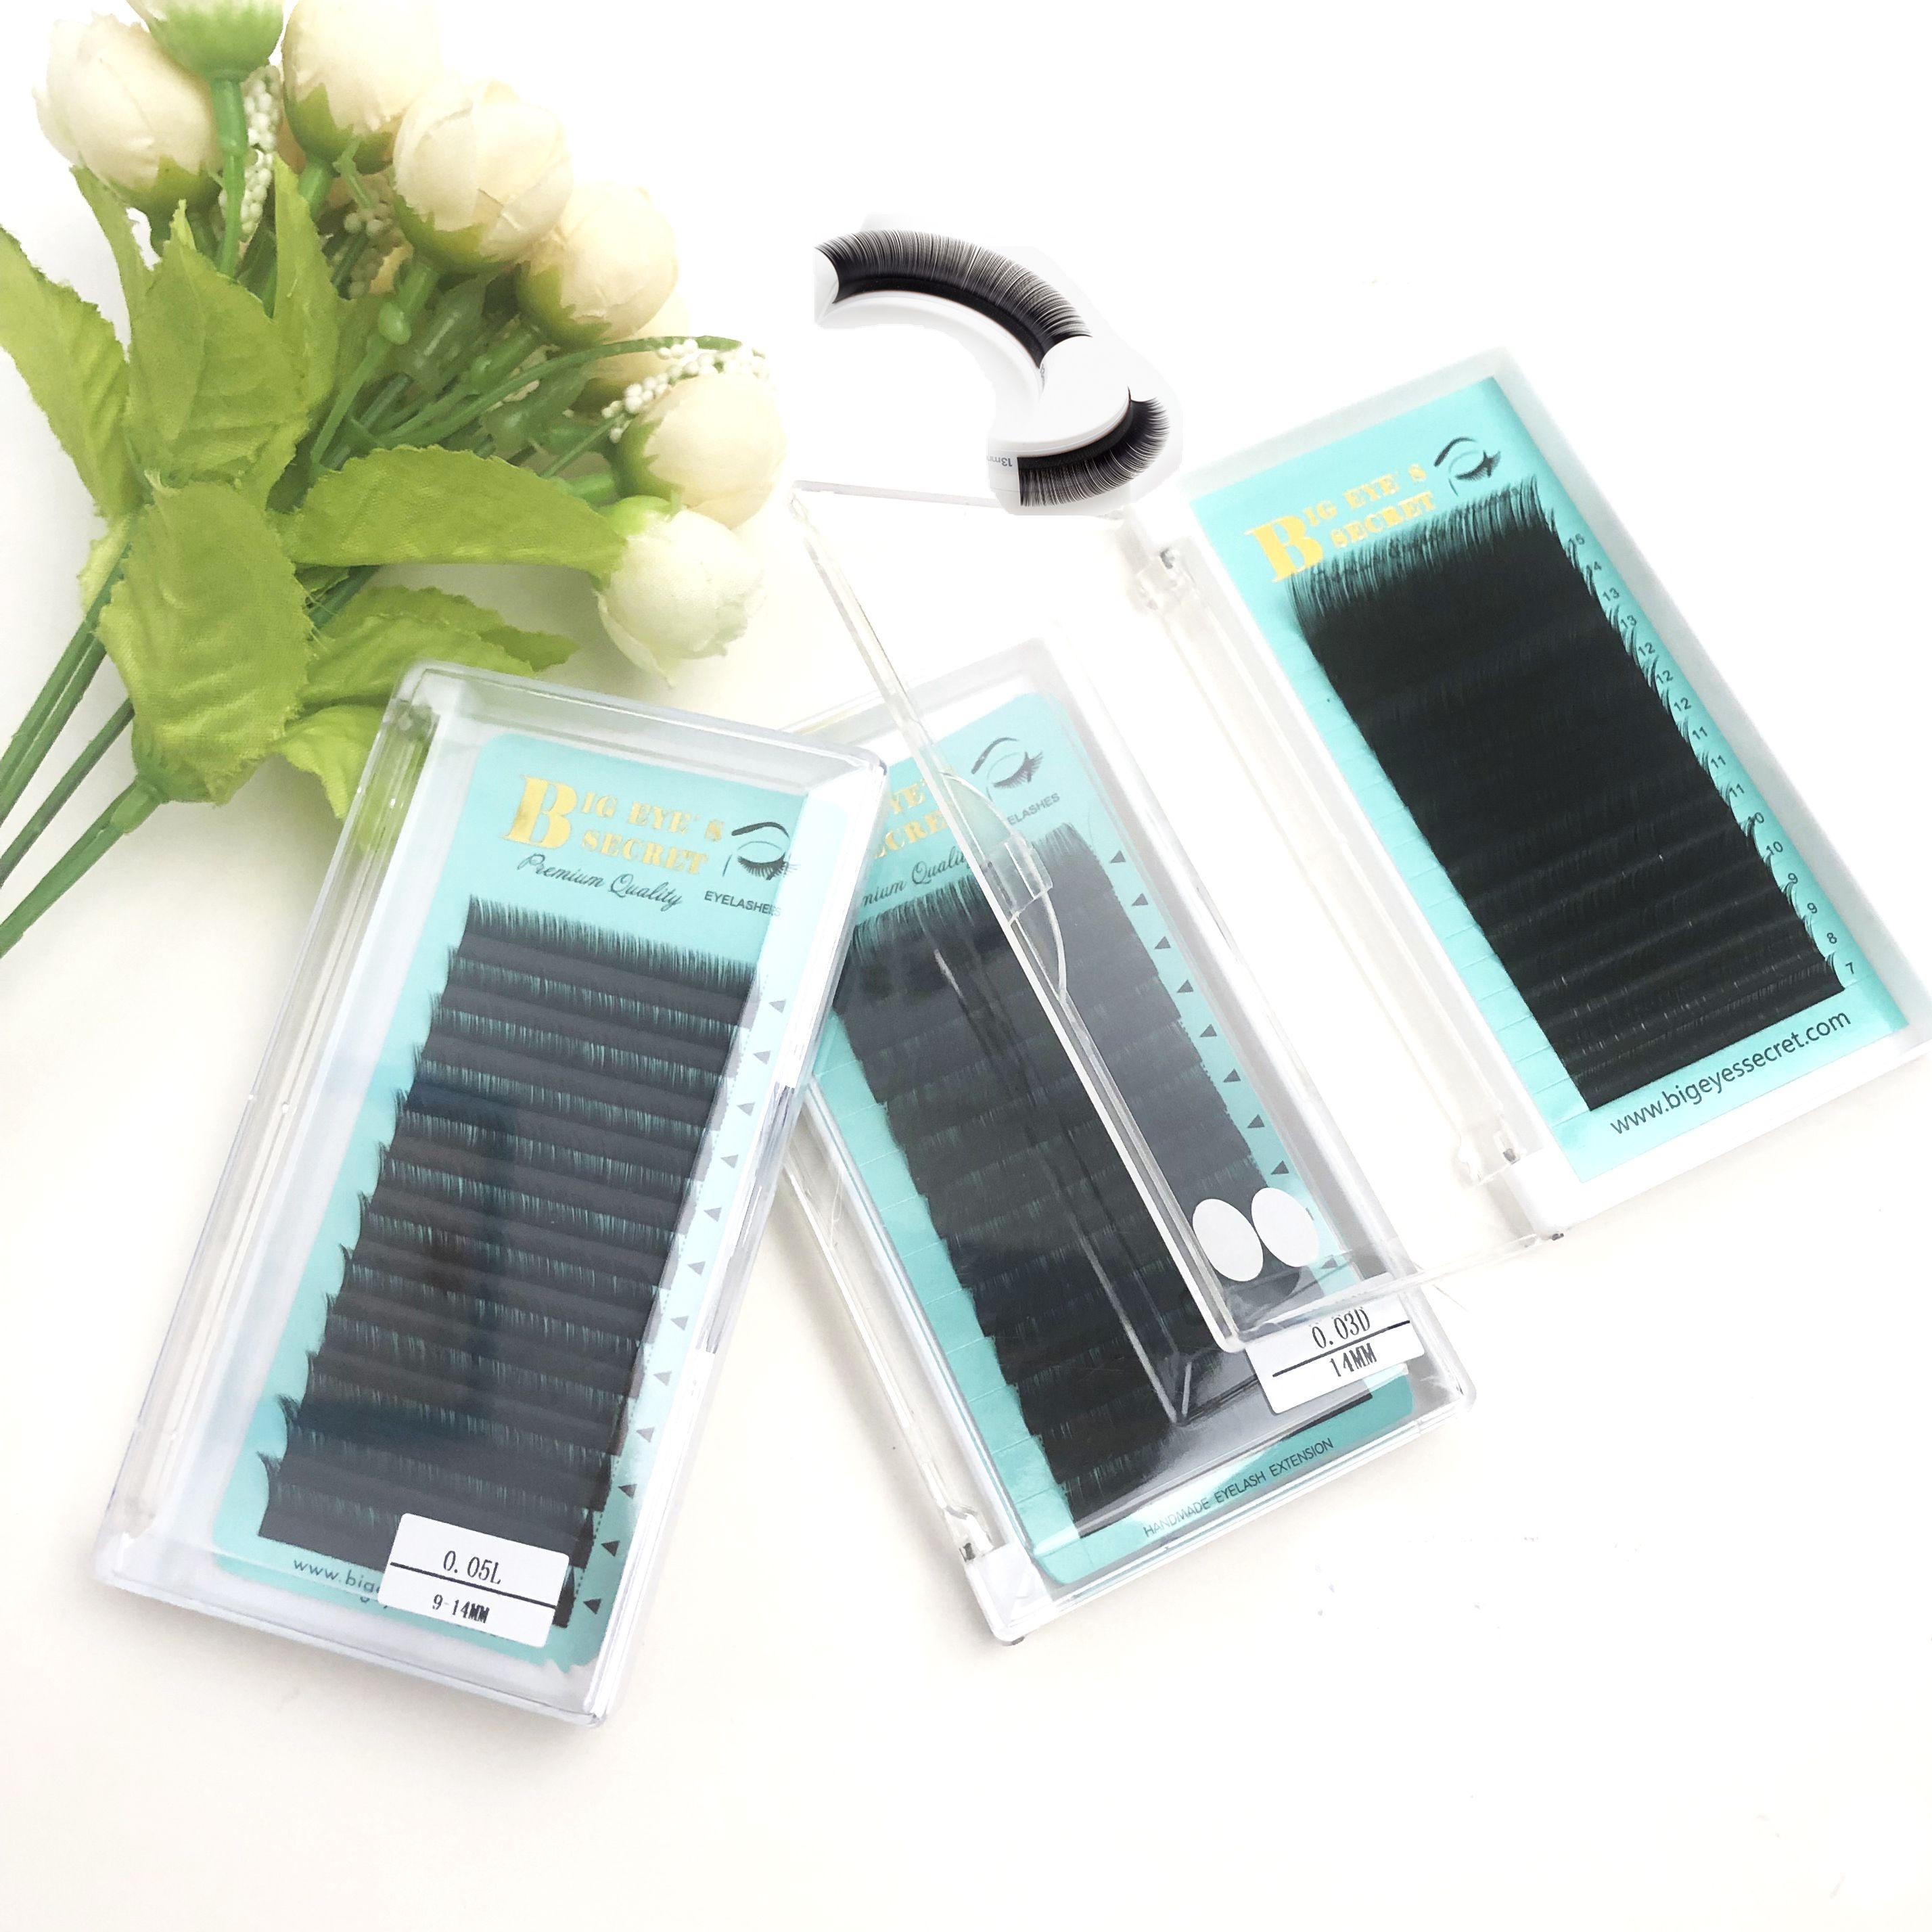 Handmade high quality Wholesale 2D 3D 4D 5D 6D Volume Eyelashes Handmade Loose Korea Long stem Pre Fanned Lashes